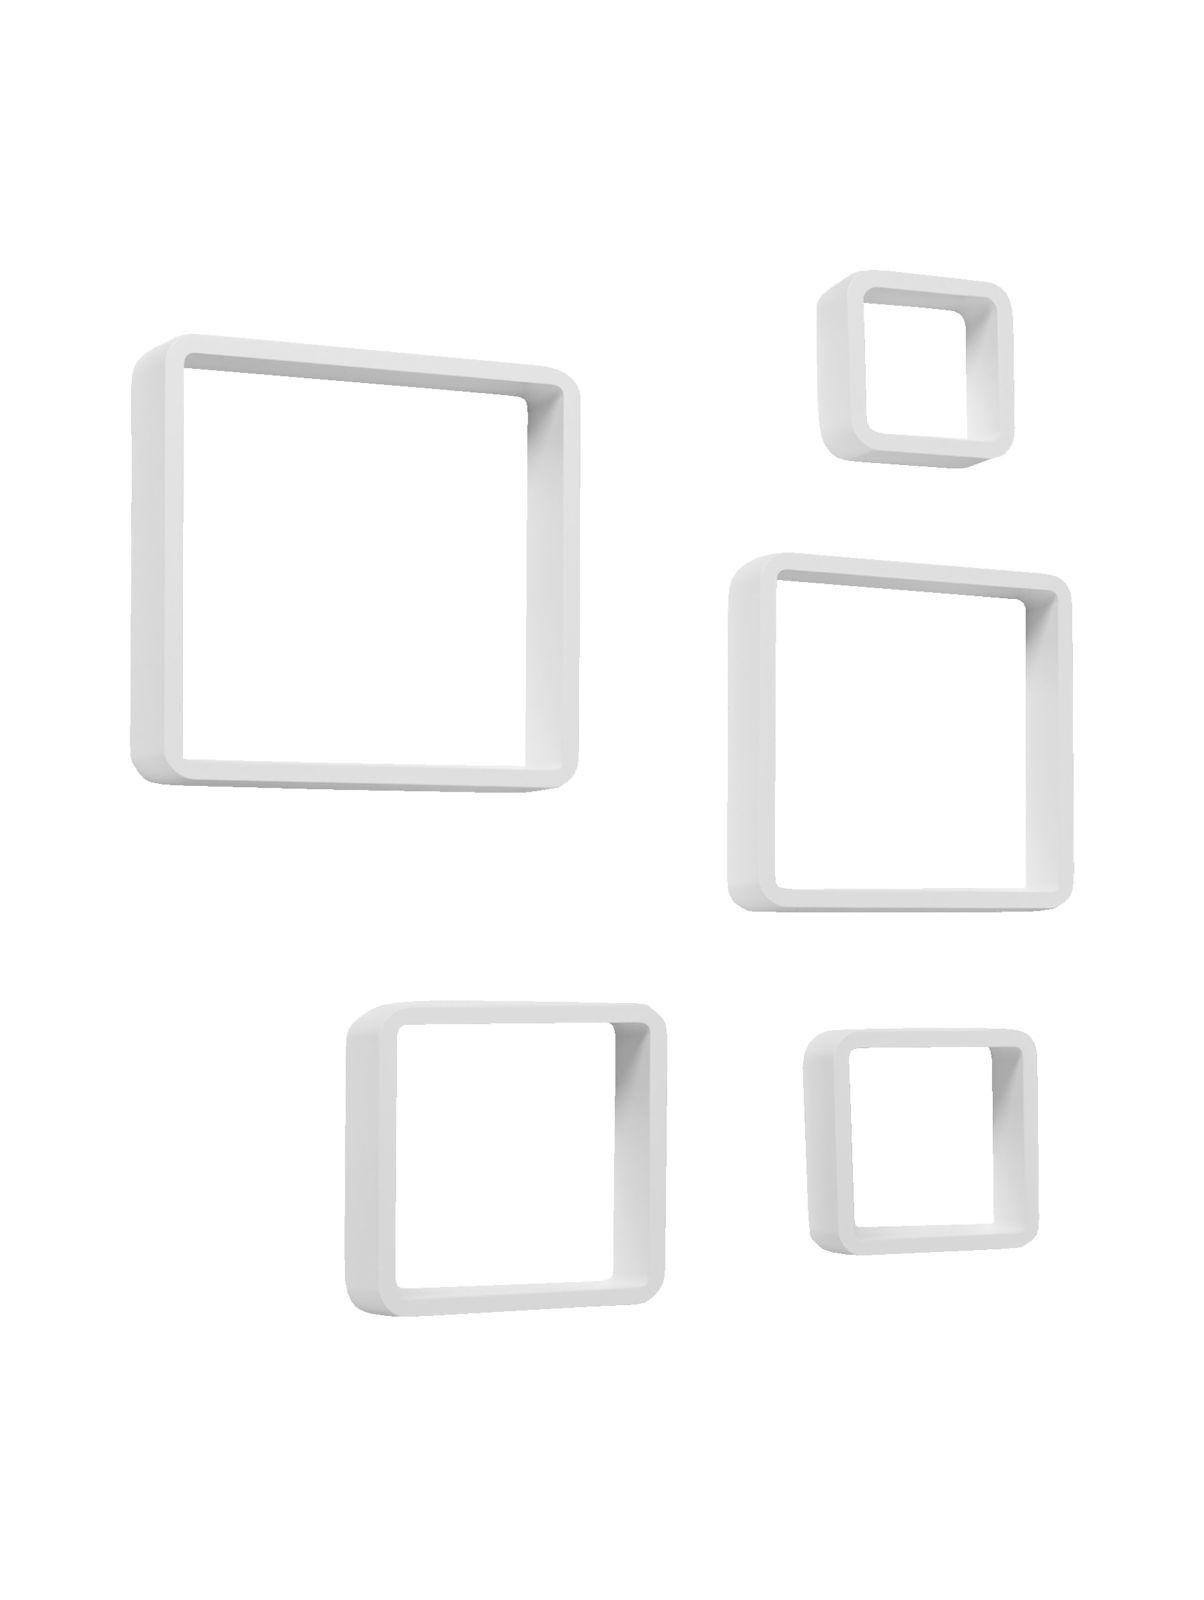 Regal Set, 5 Tlg. Cube, Modern Jetzt Bestellen Unter: Https